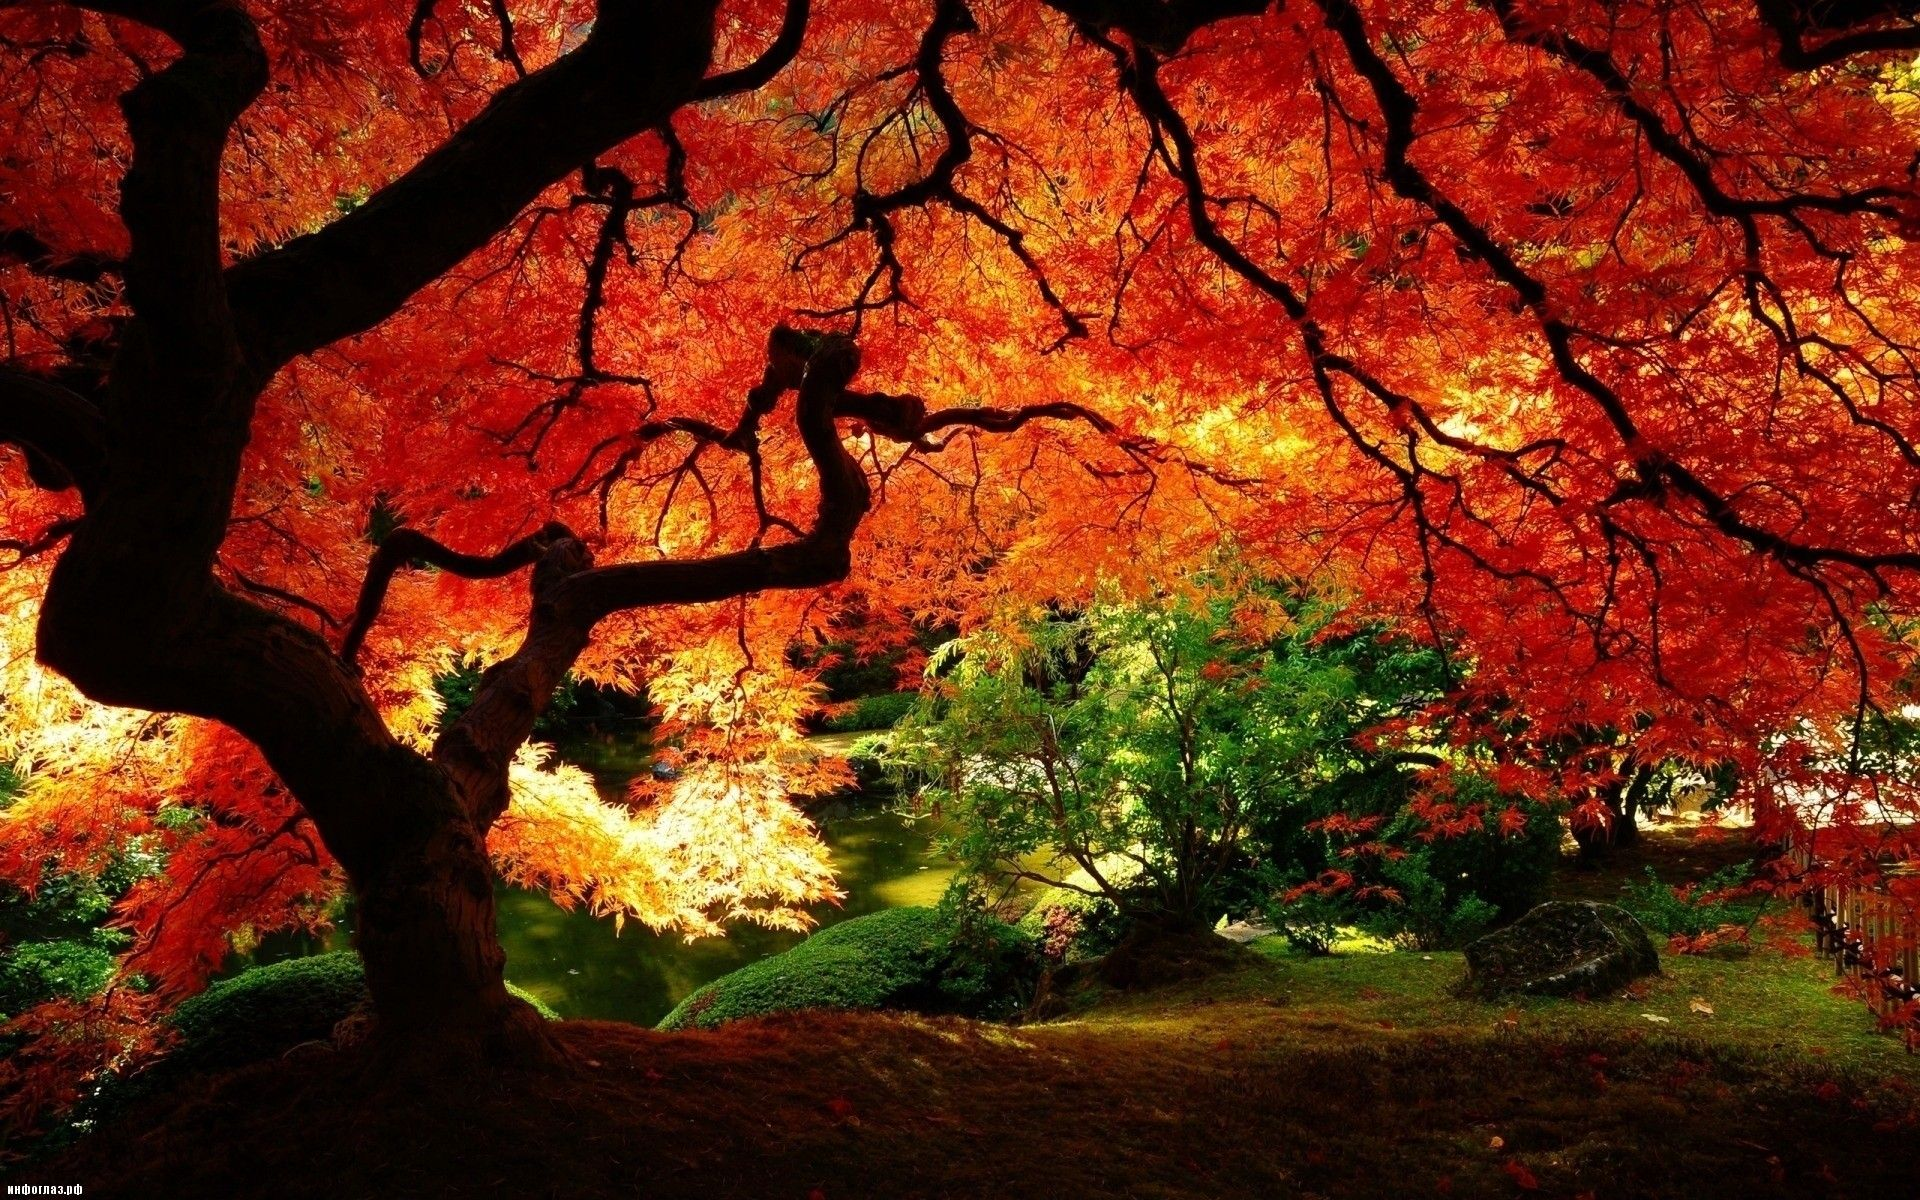 Kartinki Po Zaprosu Samye Krasivye Mesta V Mire Autumn Scenery Landscape Wallpaper Fall Wallpaper